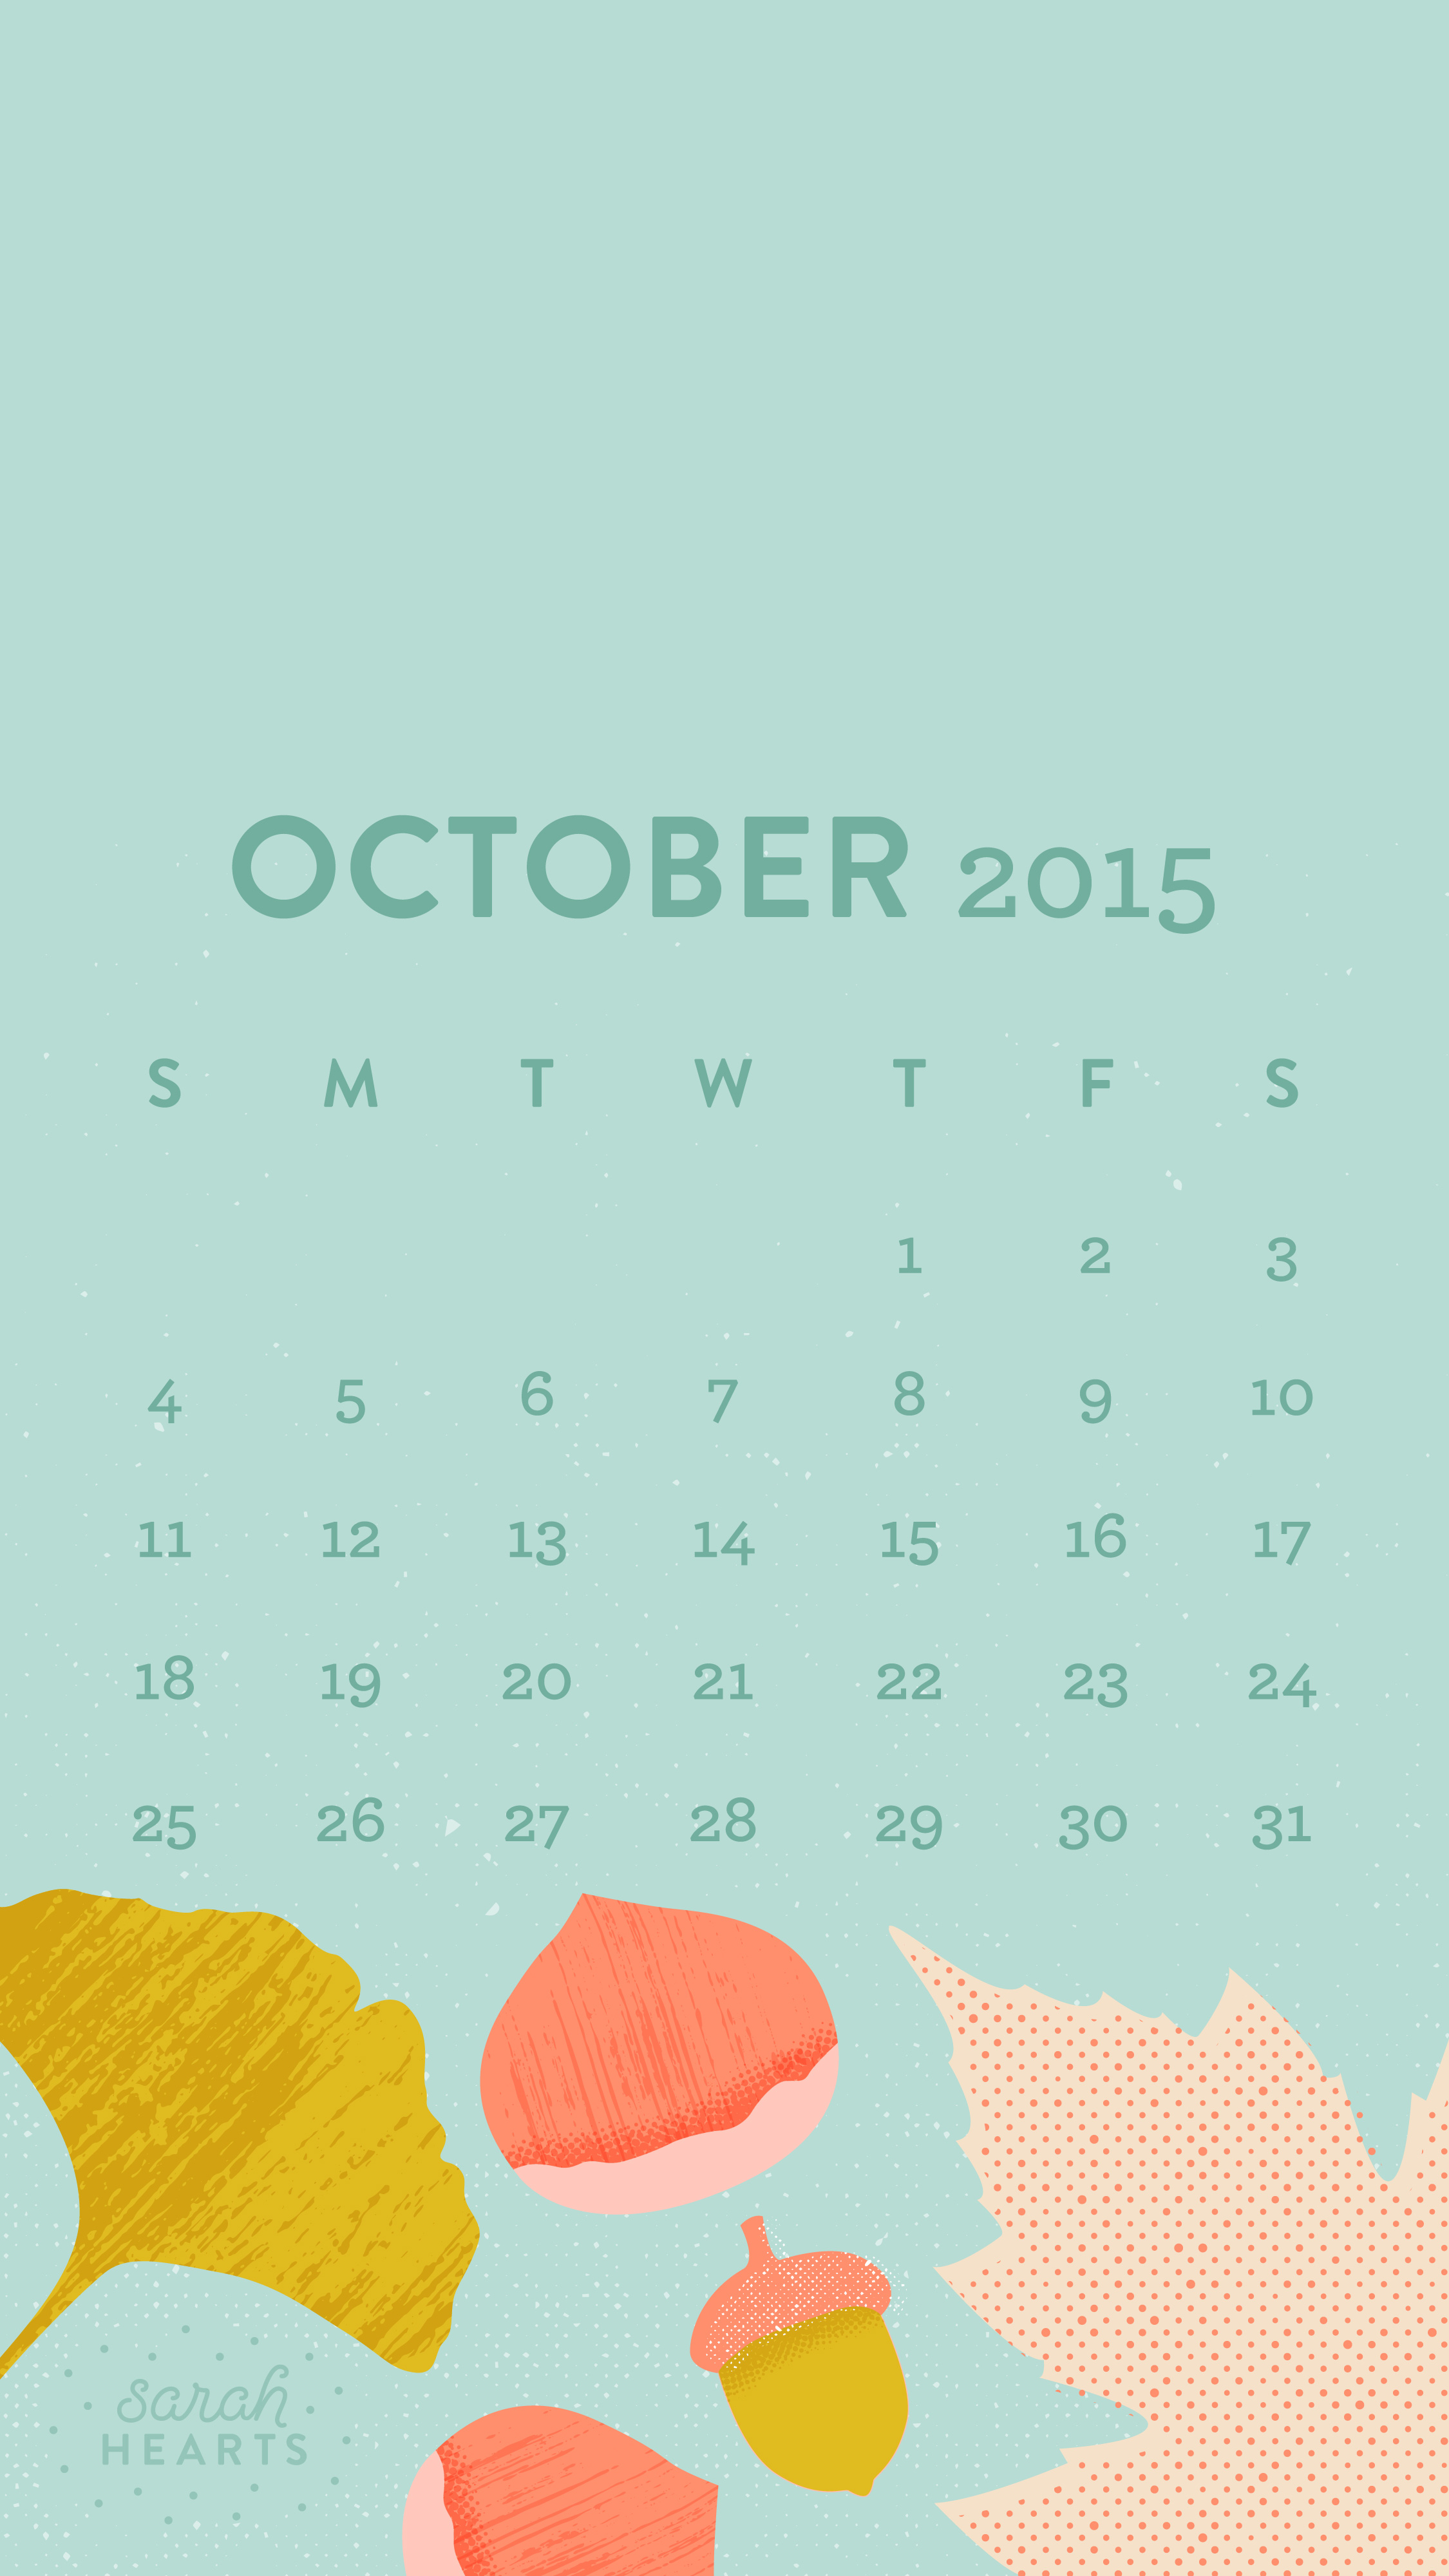 October 2015 Calendar Wallpaper Sarah Hearts